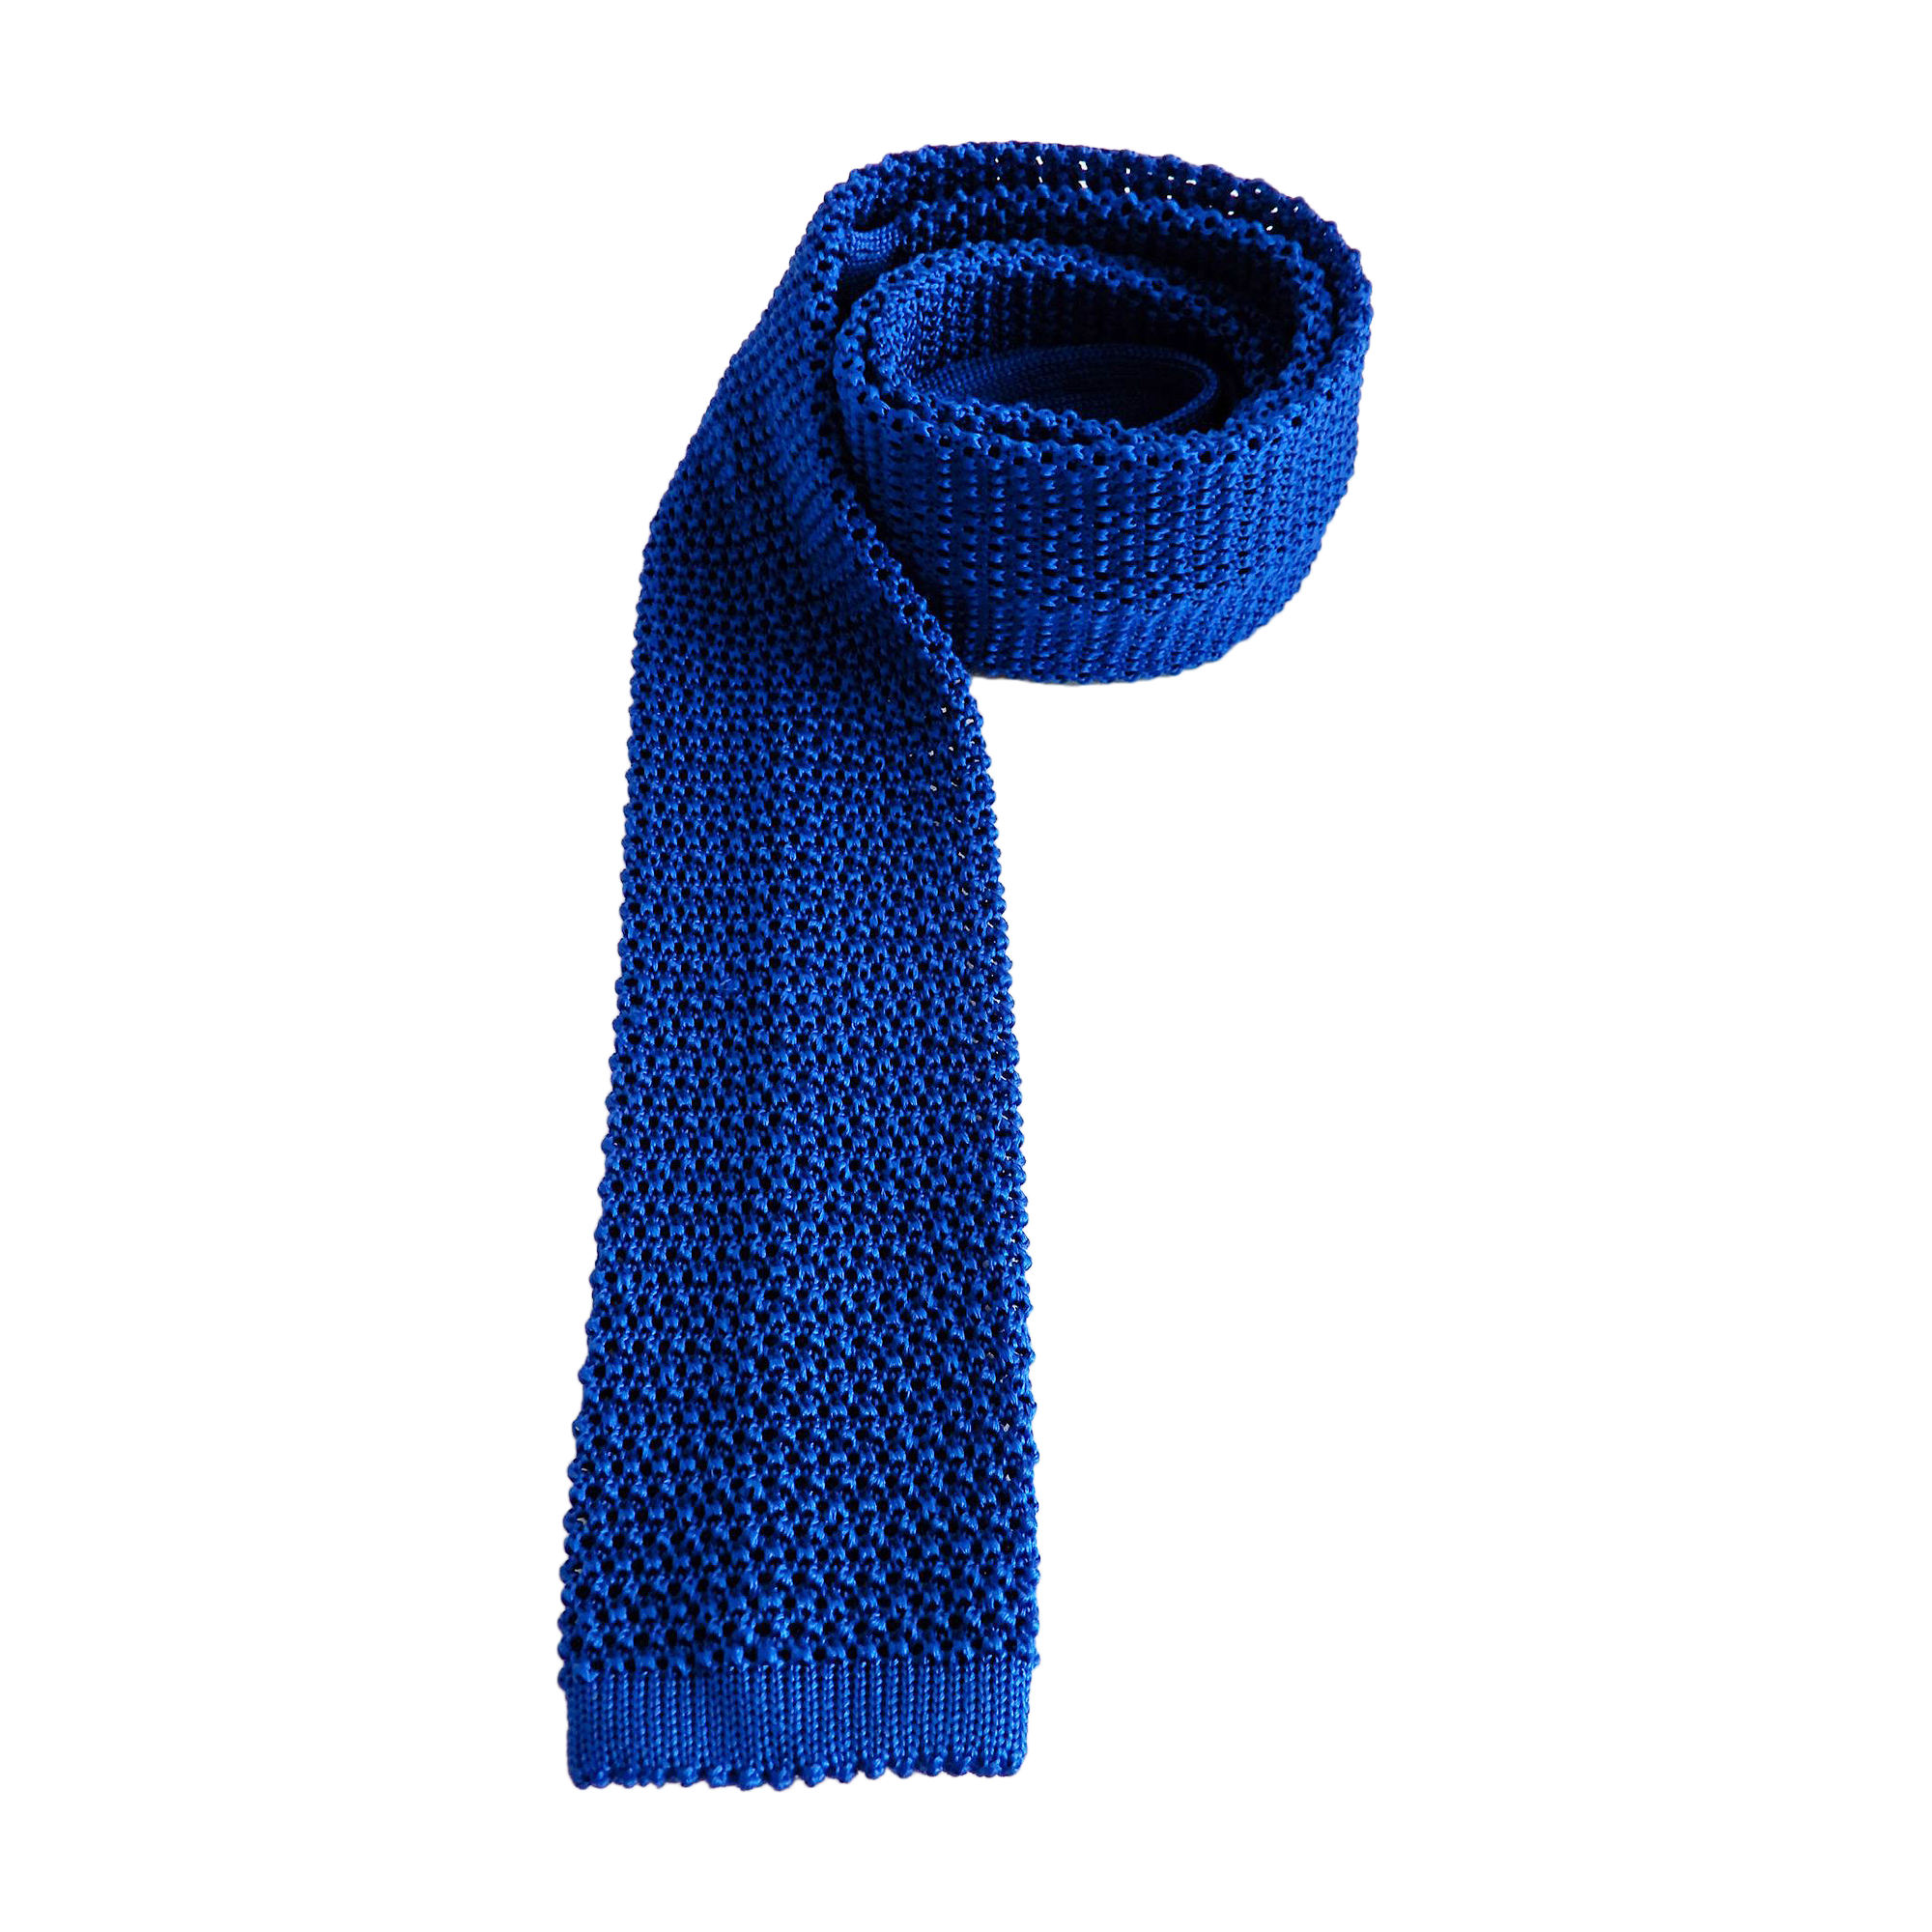 Cravate CHARVET Bleu, bleu marine, bleu turquoise